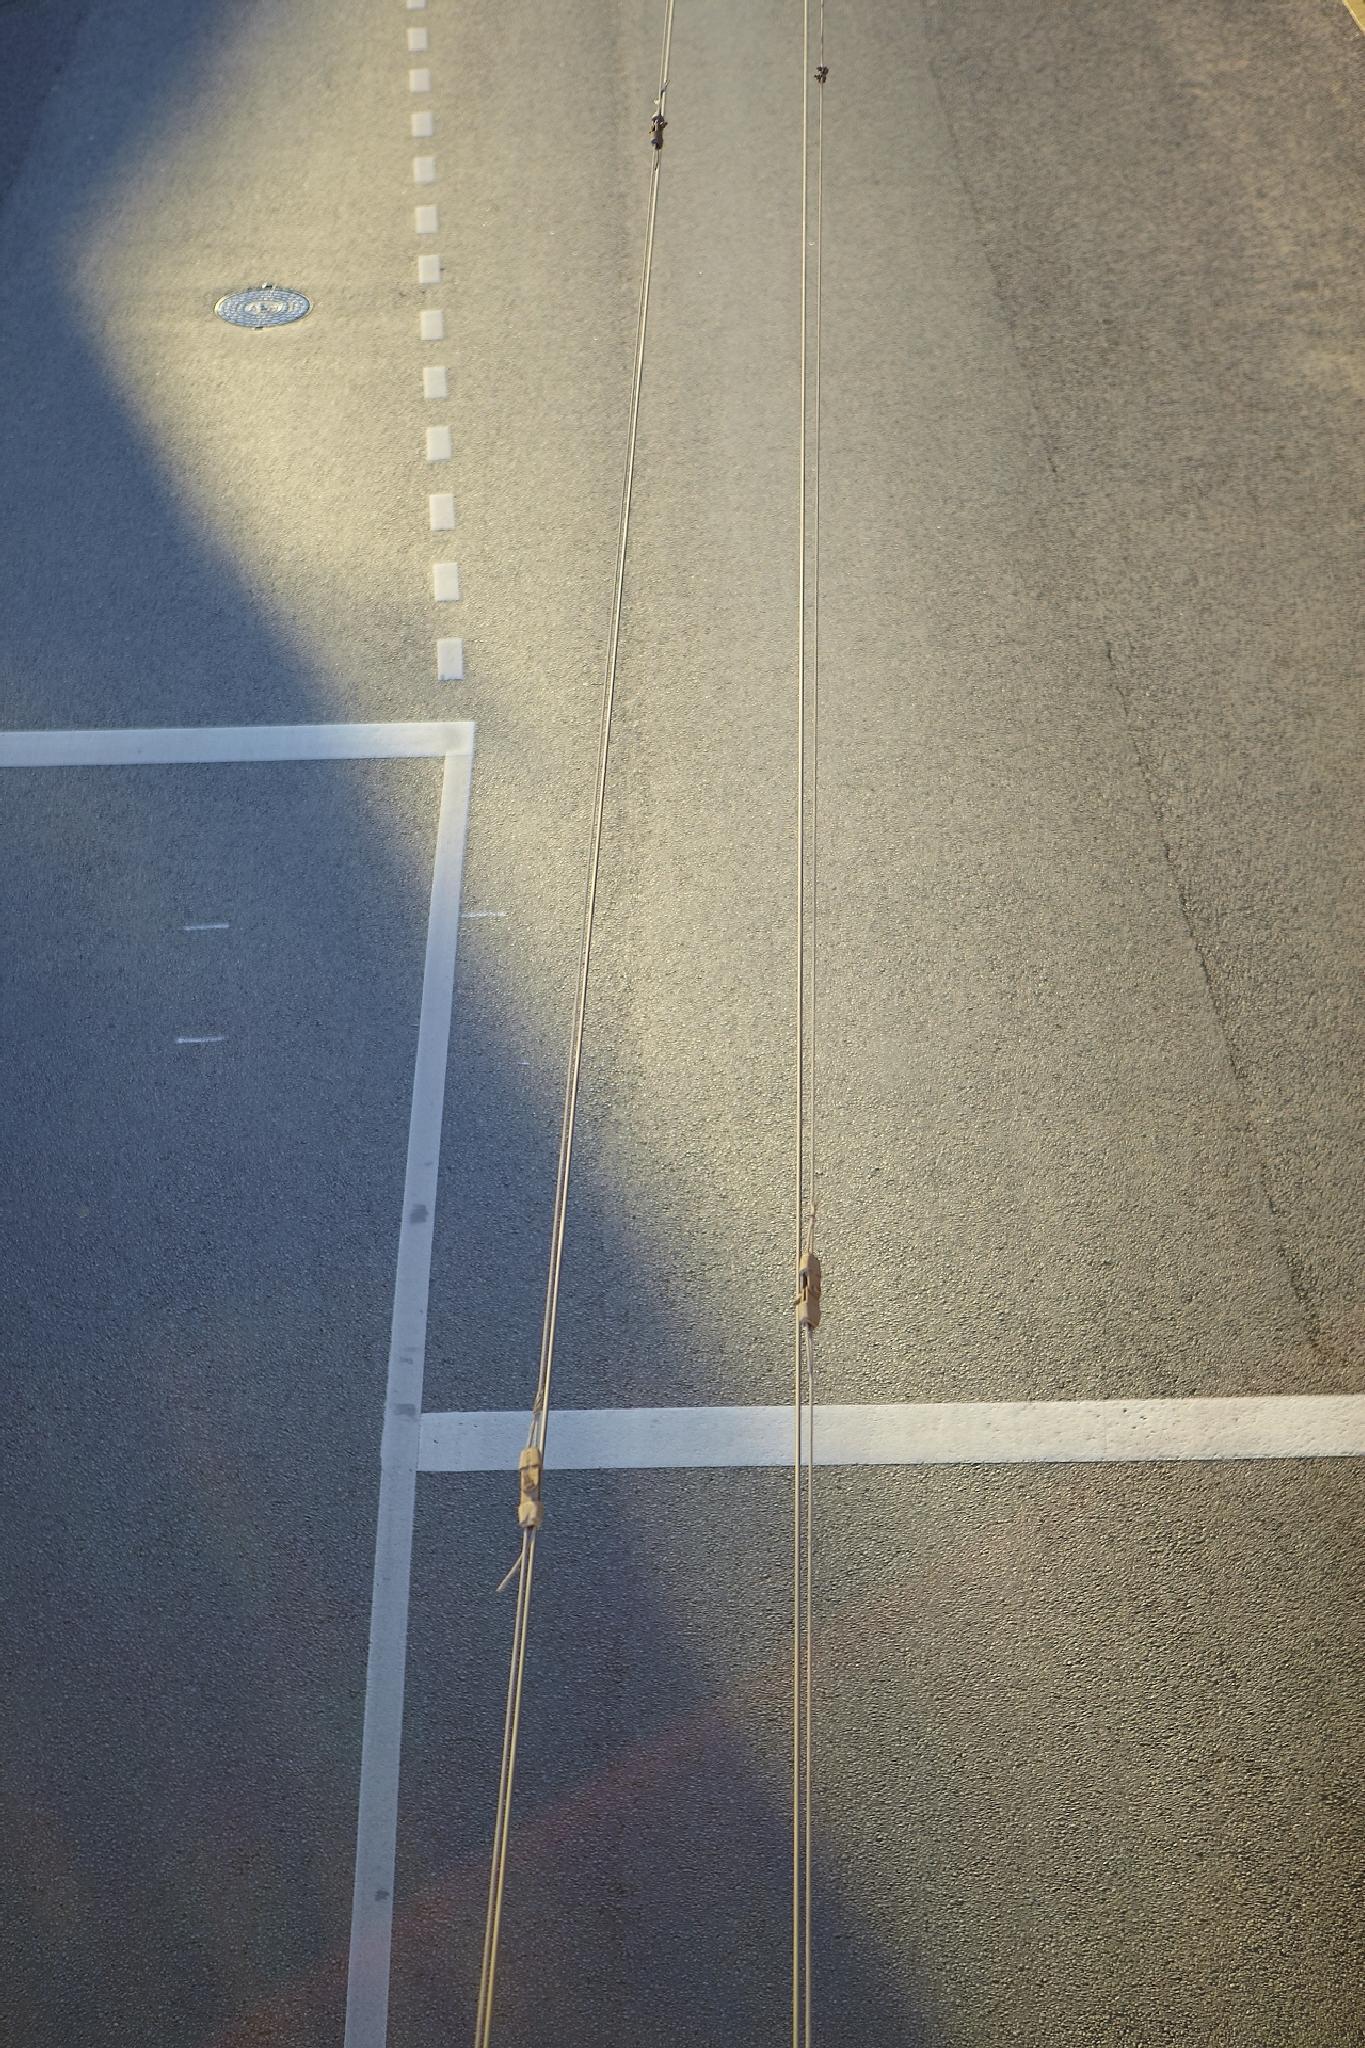 the road by Vladimir Kuleshov